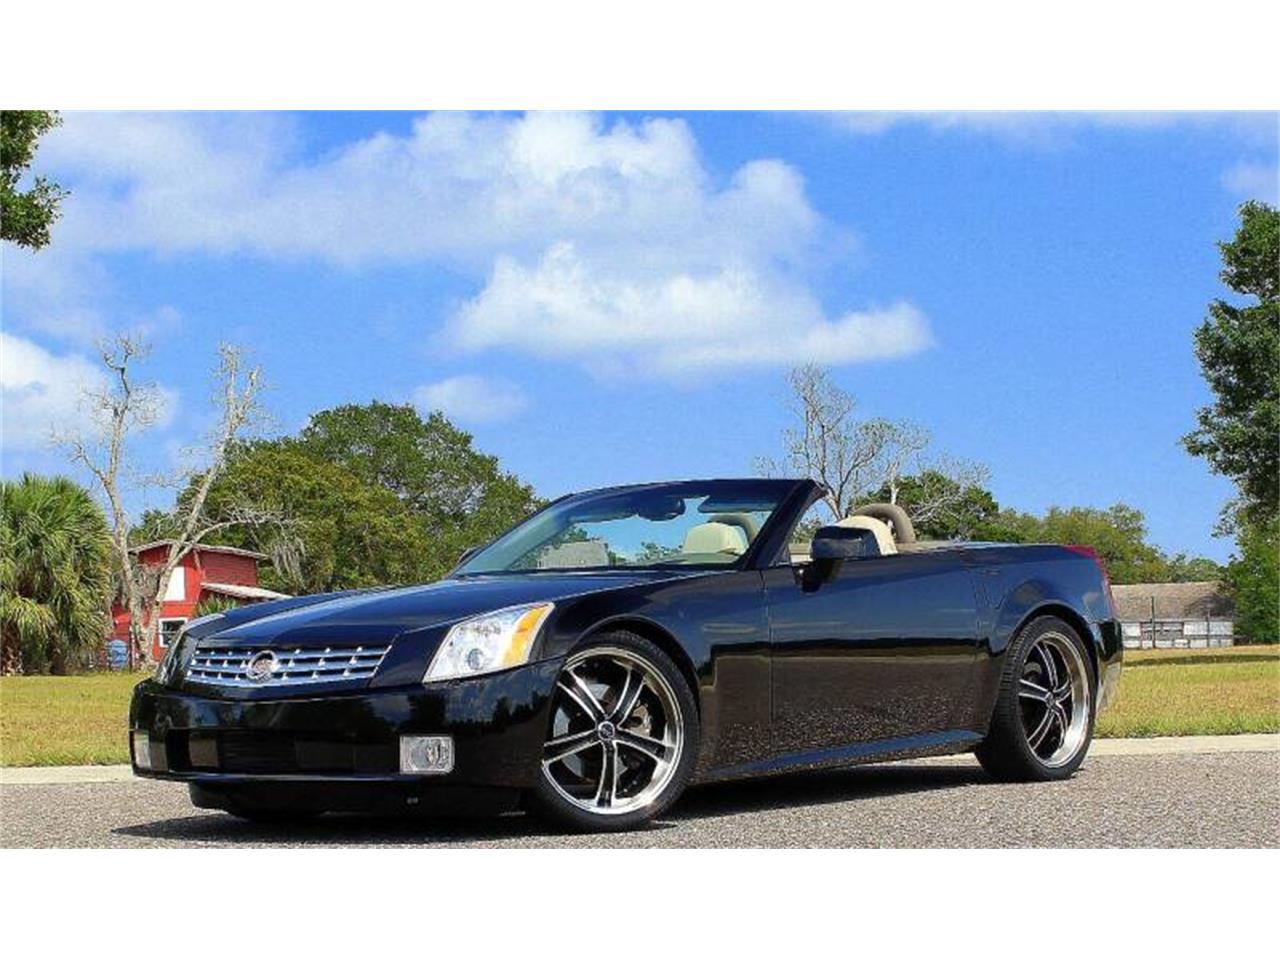 2005 cadillac xlr for sale | classiccars | cc-1343742